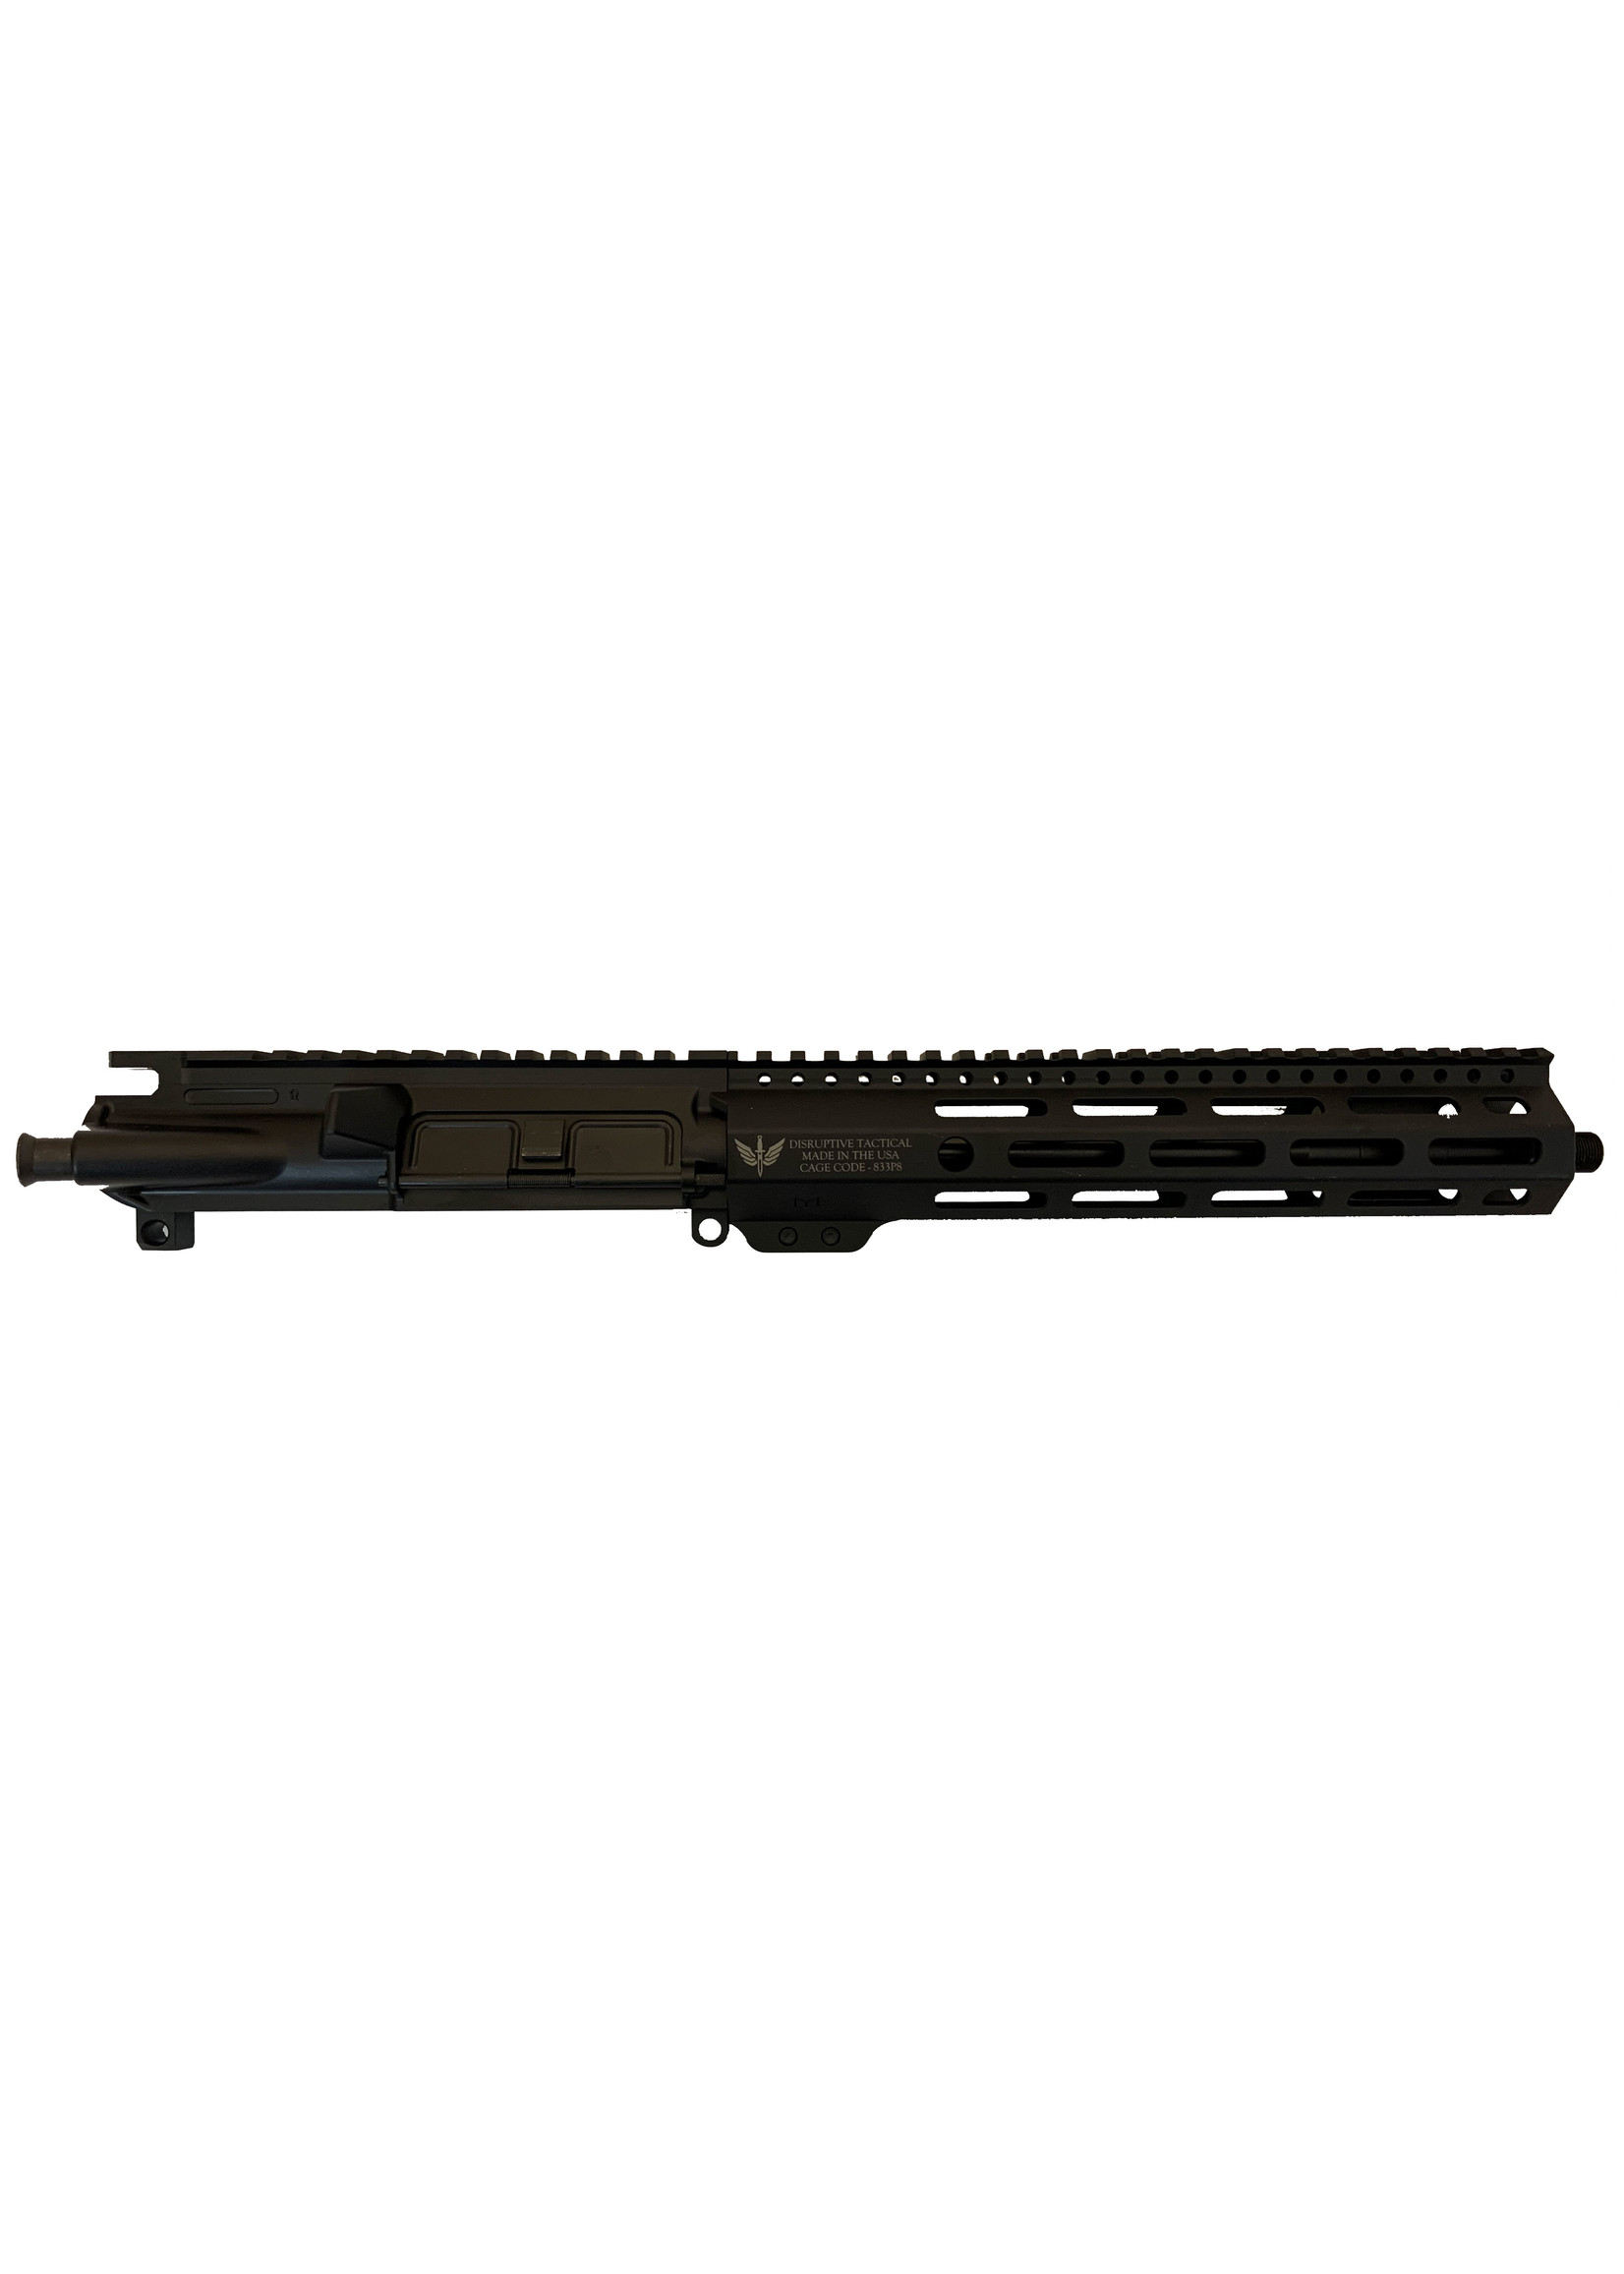 Disruptive Tactical DT15 MK18 UPPER wo/BCG/Charging Handle